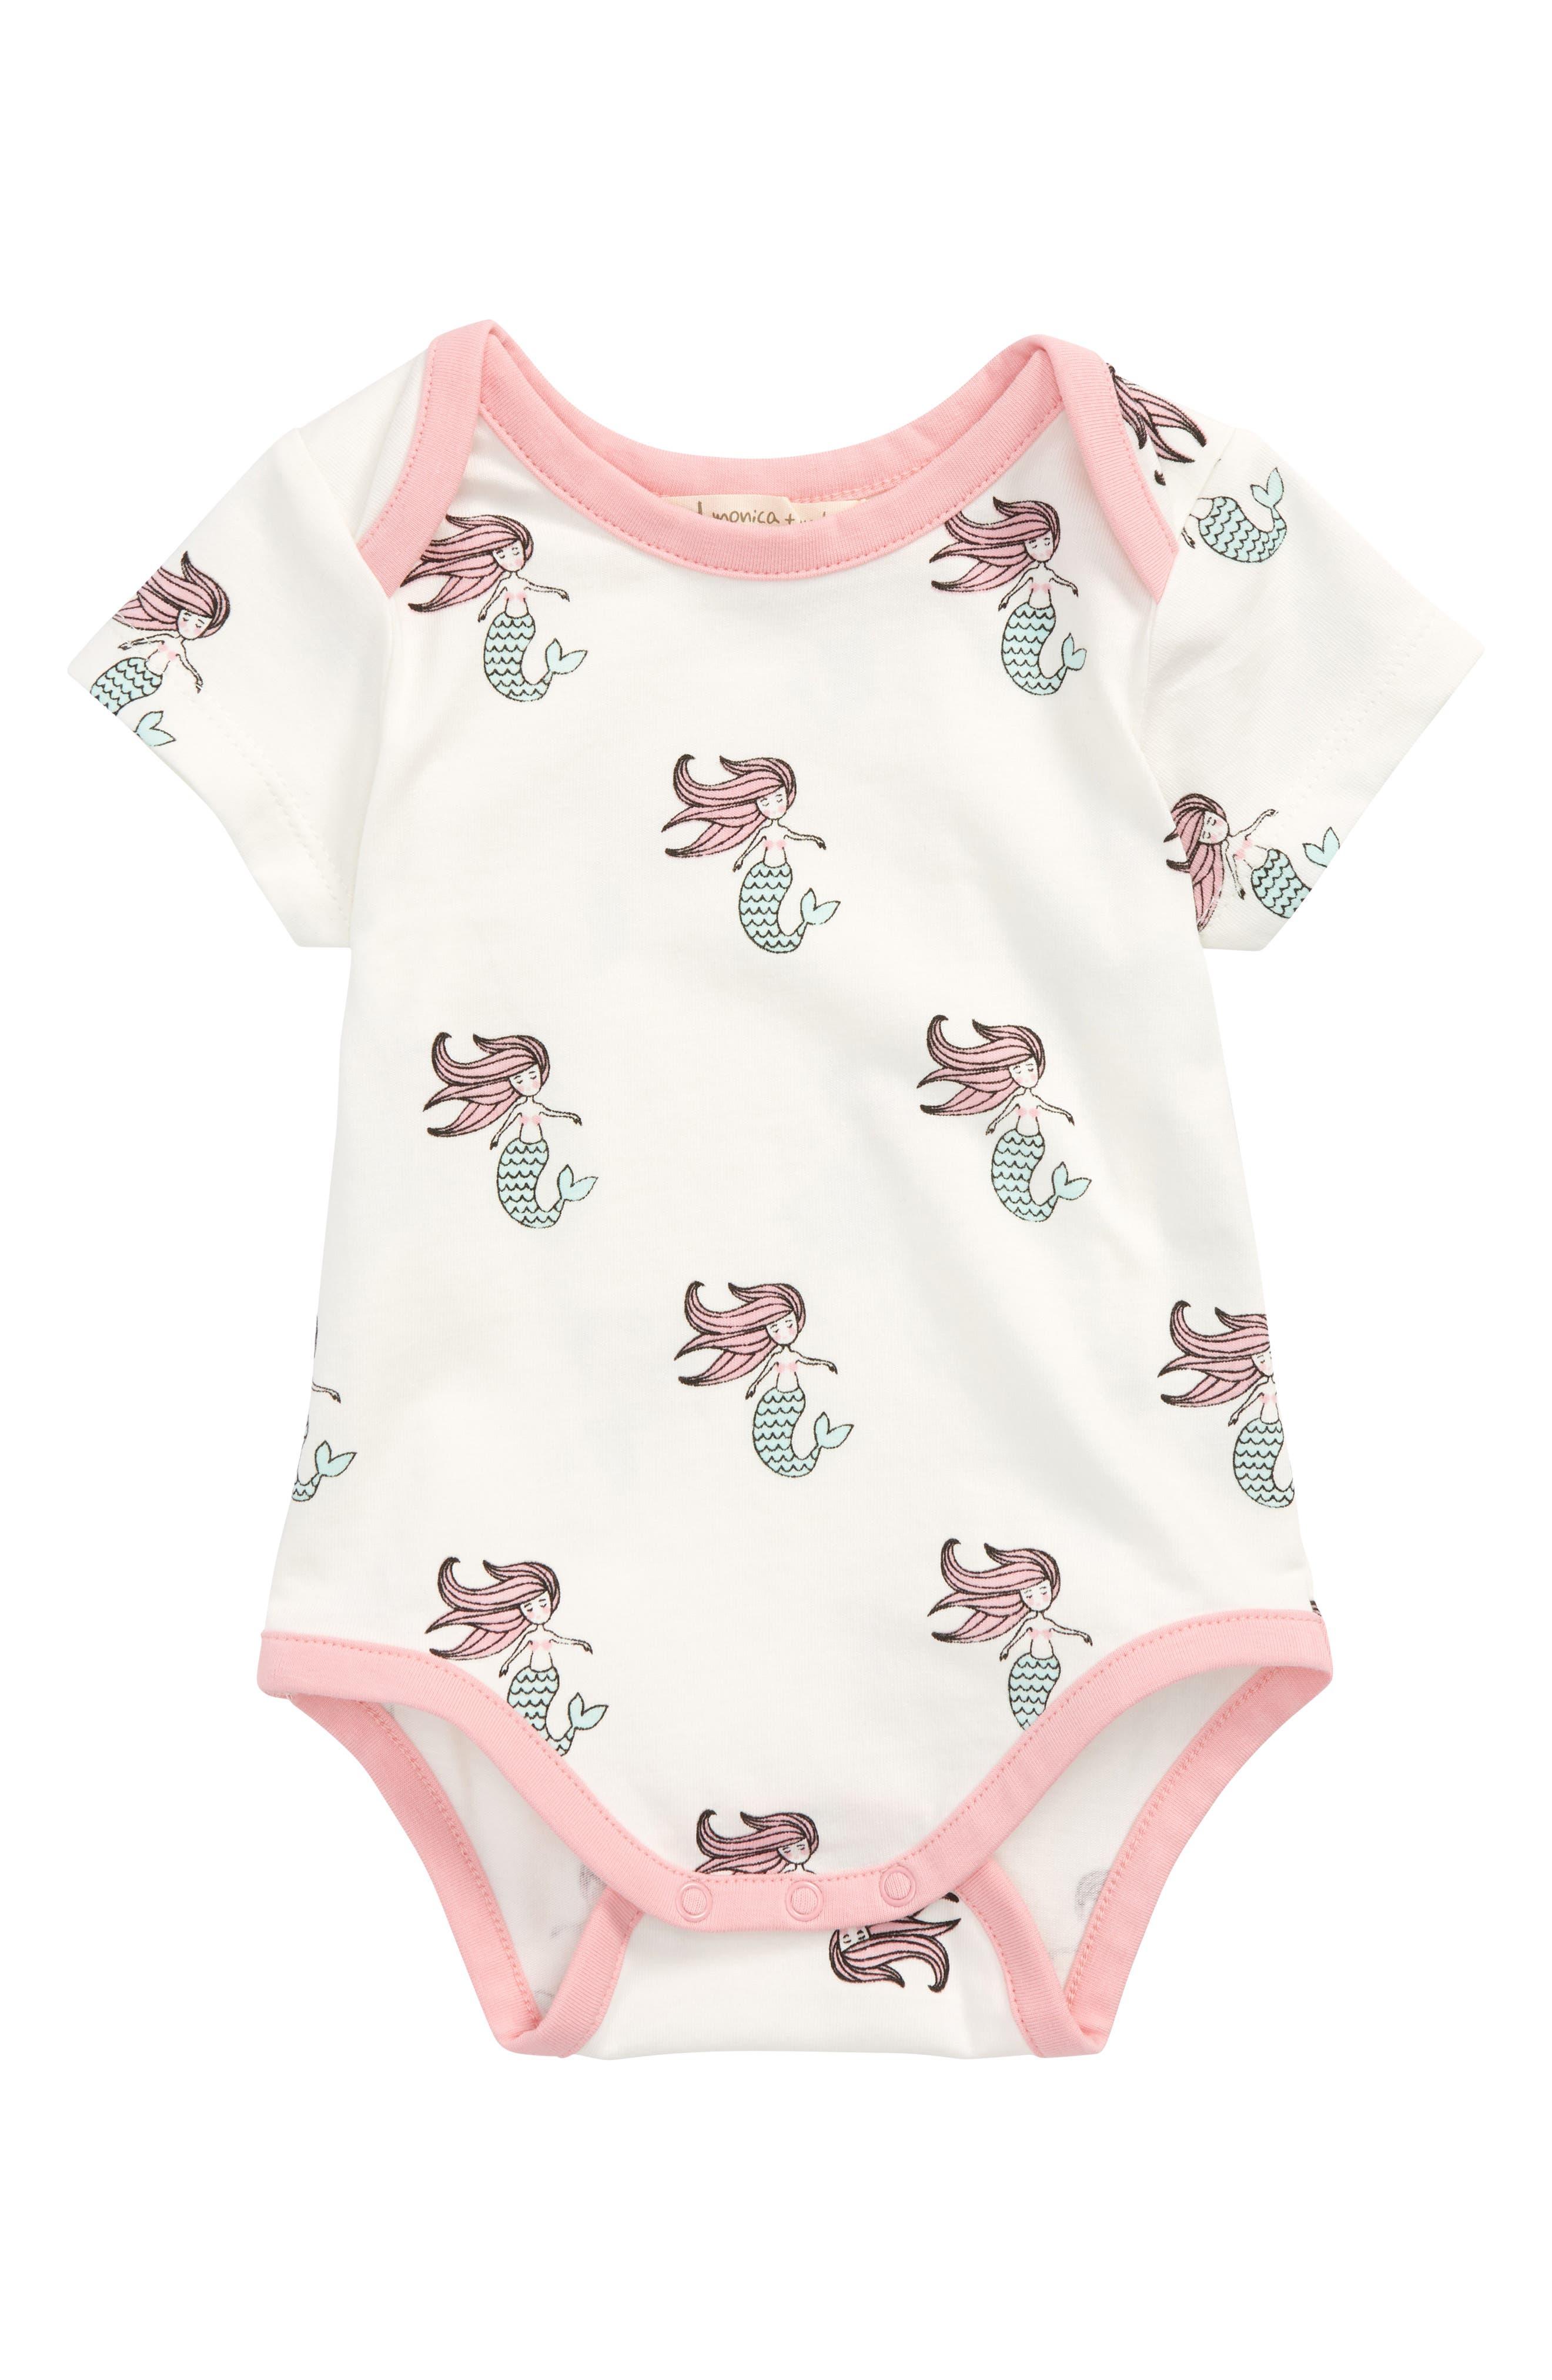 Monica + Andy Jack Jill - Mermaid Bodysuit (Baby Girls)